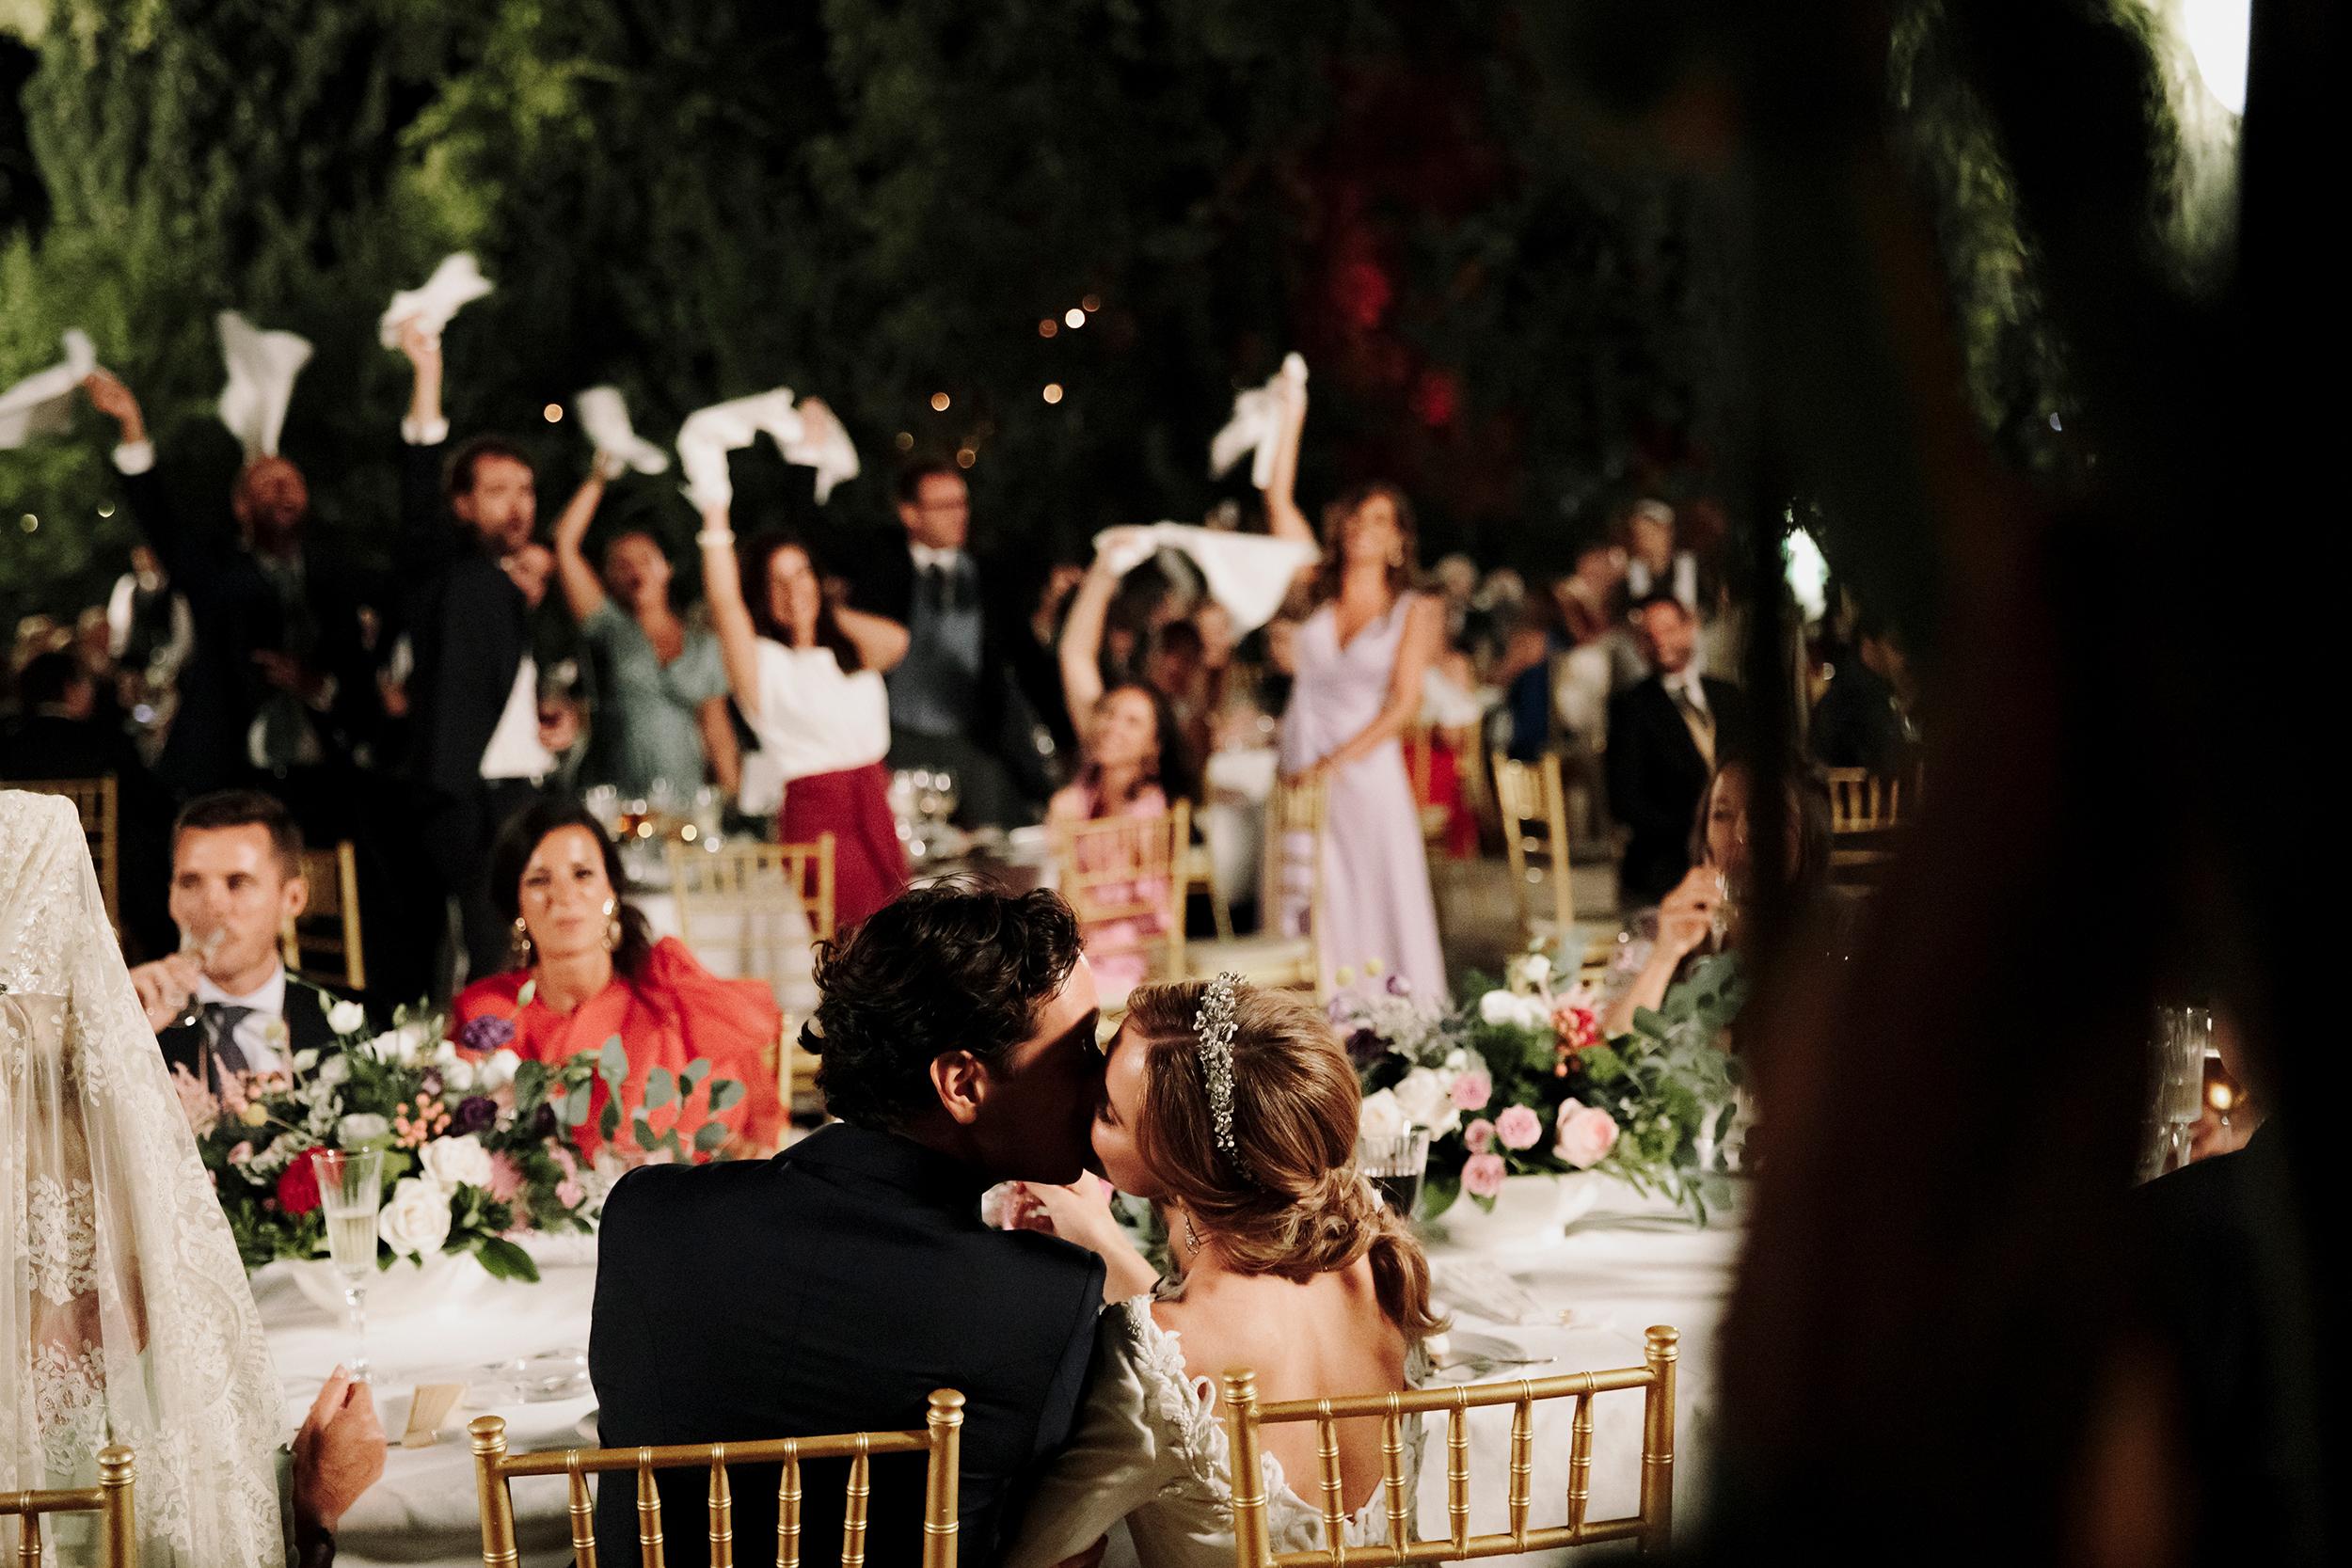 fotografo-bodas-granada-catedral-sagrario-jose-reyes_078.jpg